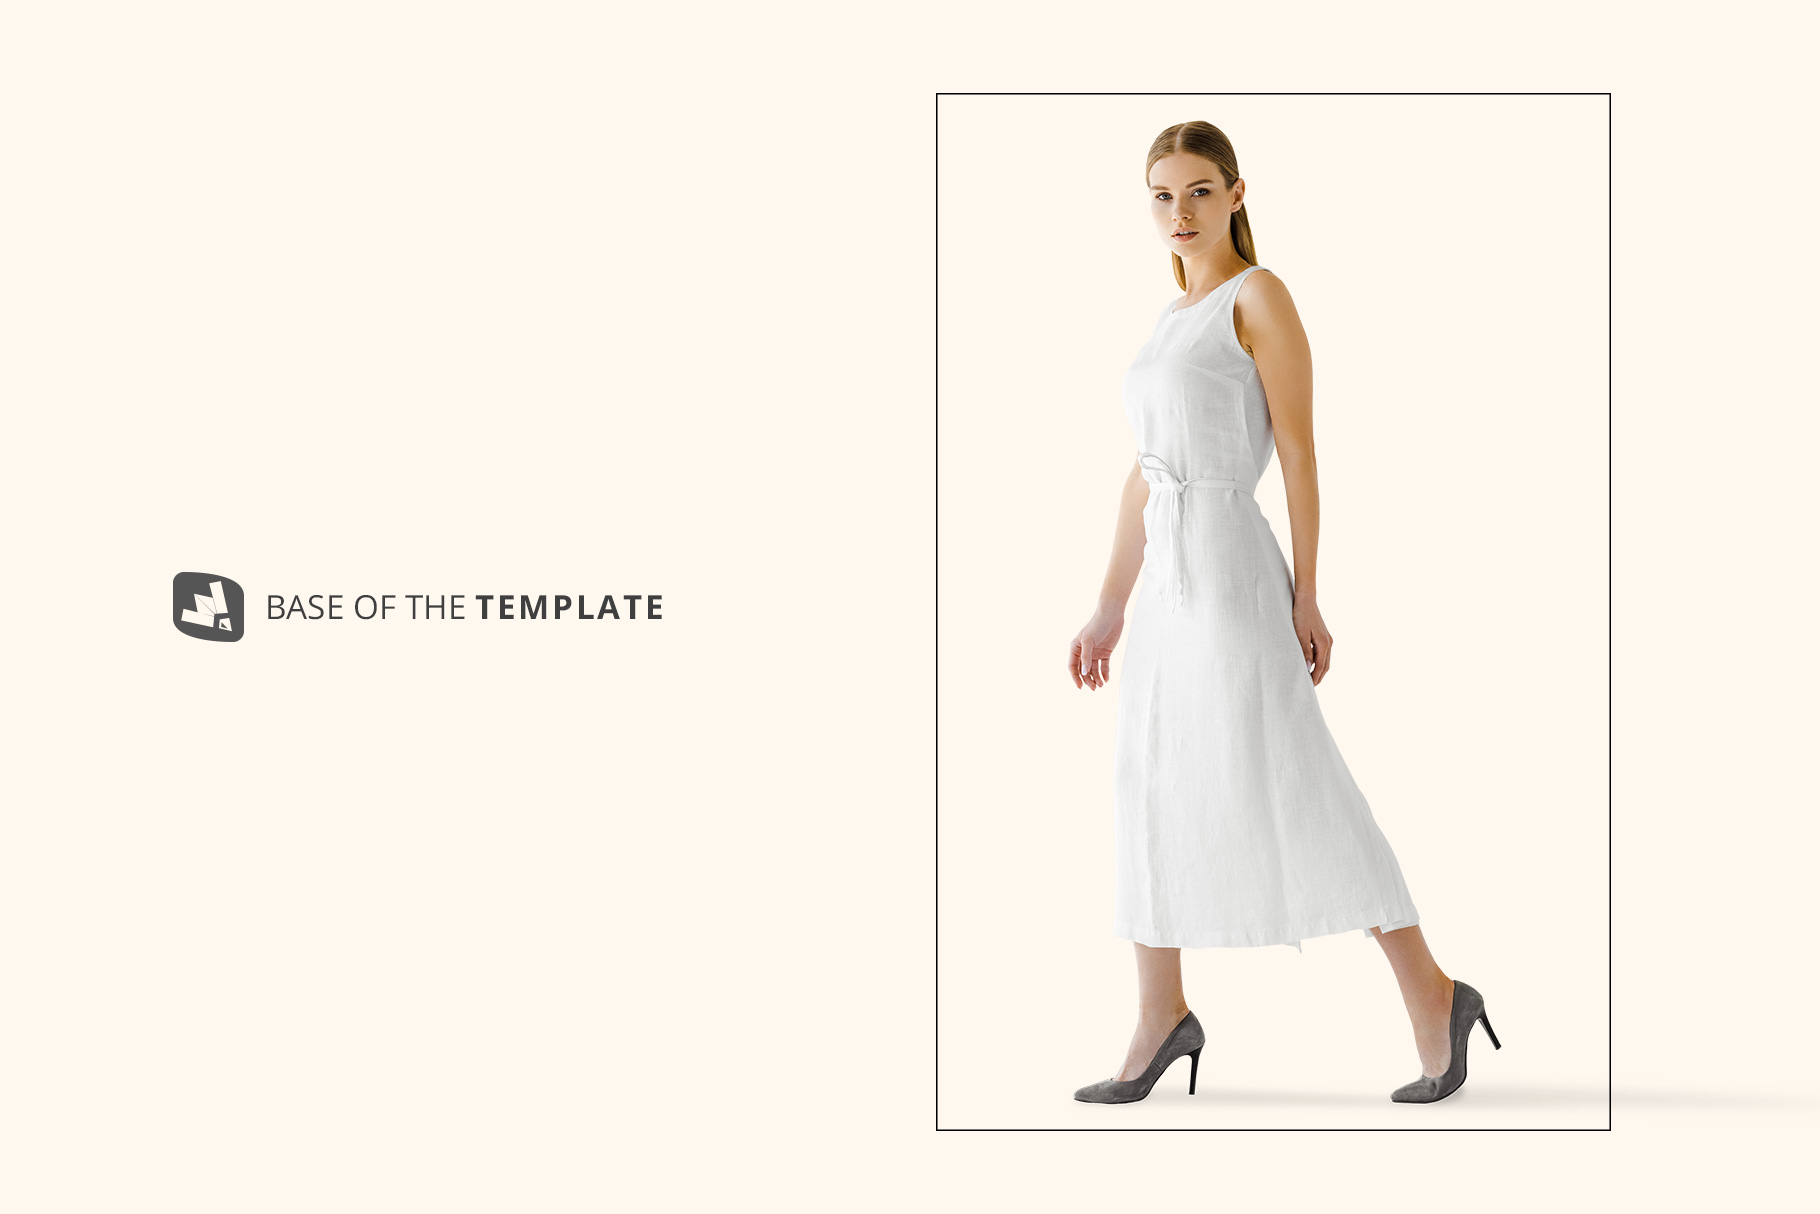 base image of the women's summer dress mockup vol.3